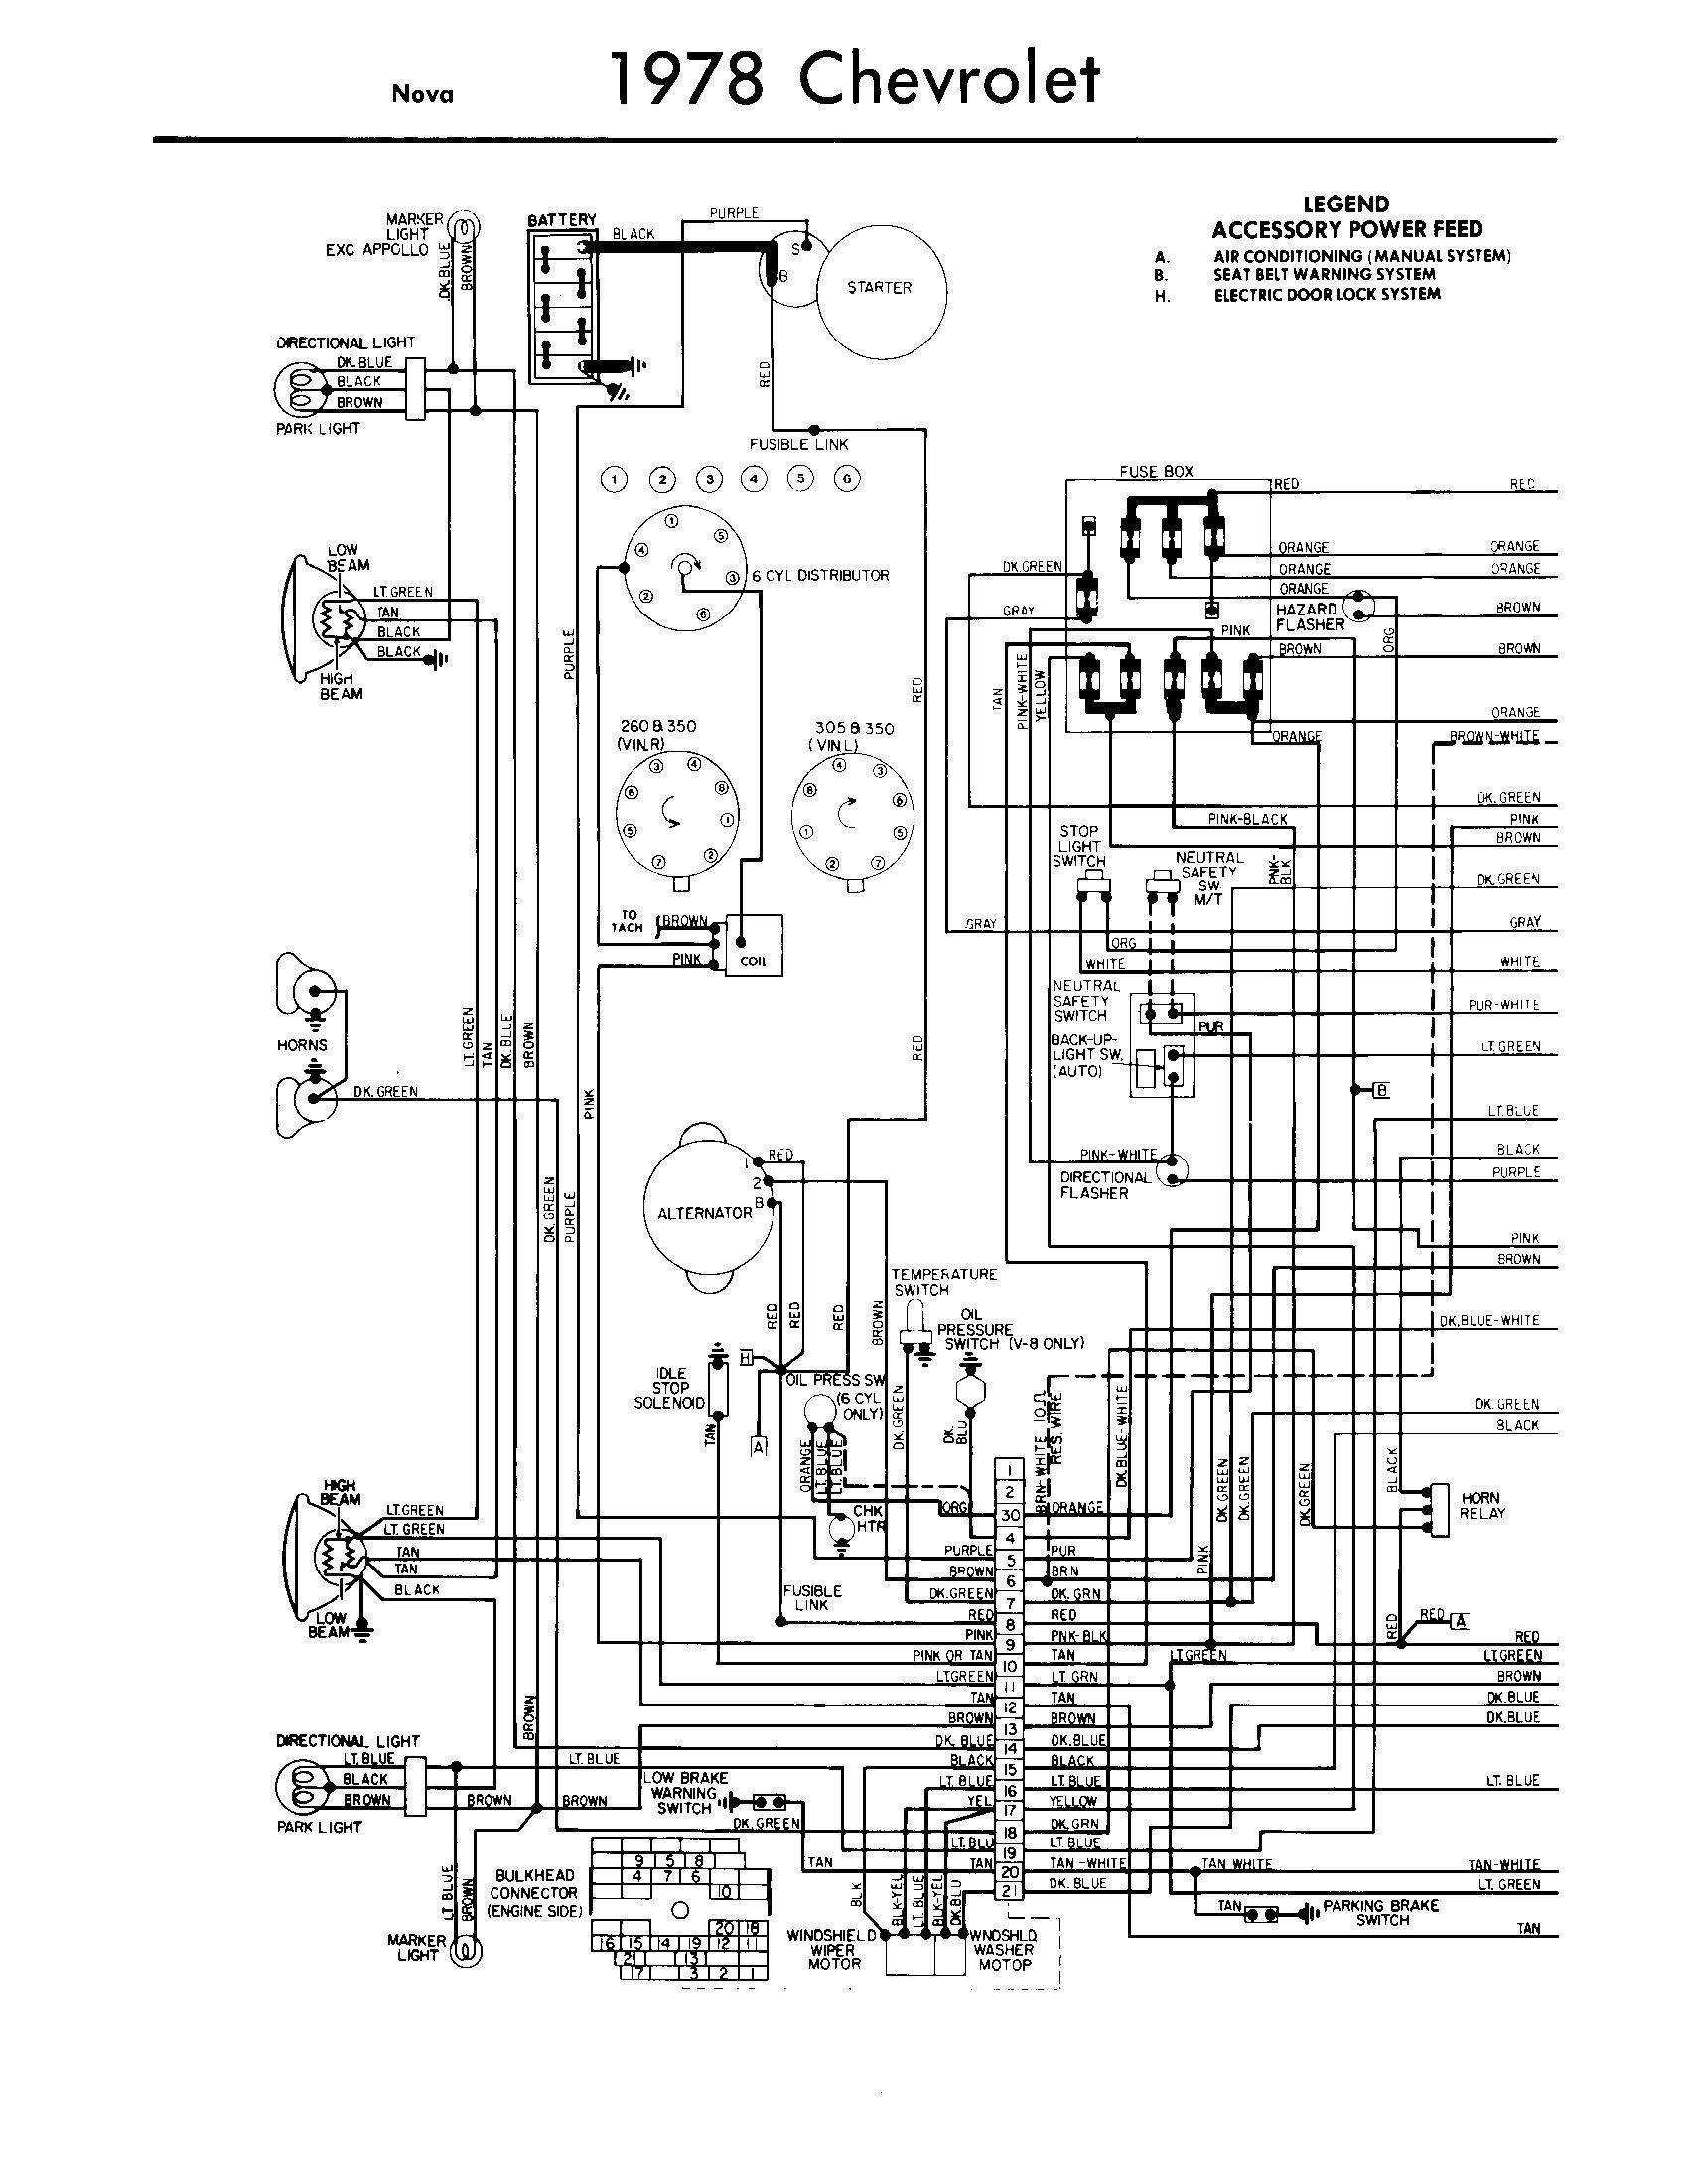 67 72 Chevy Truck Wiring Diagram 1977 Chevy Truck Alternator Wiring Diagram  Wiring Data Of 67